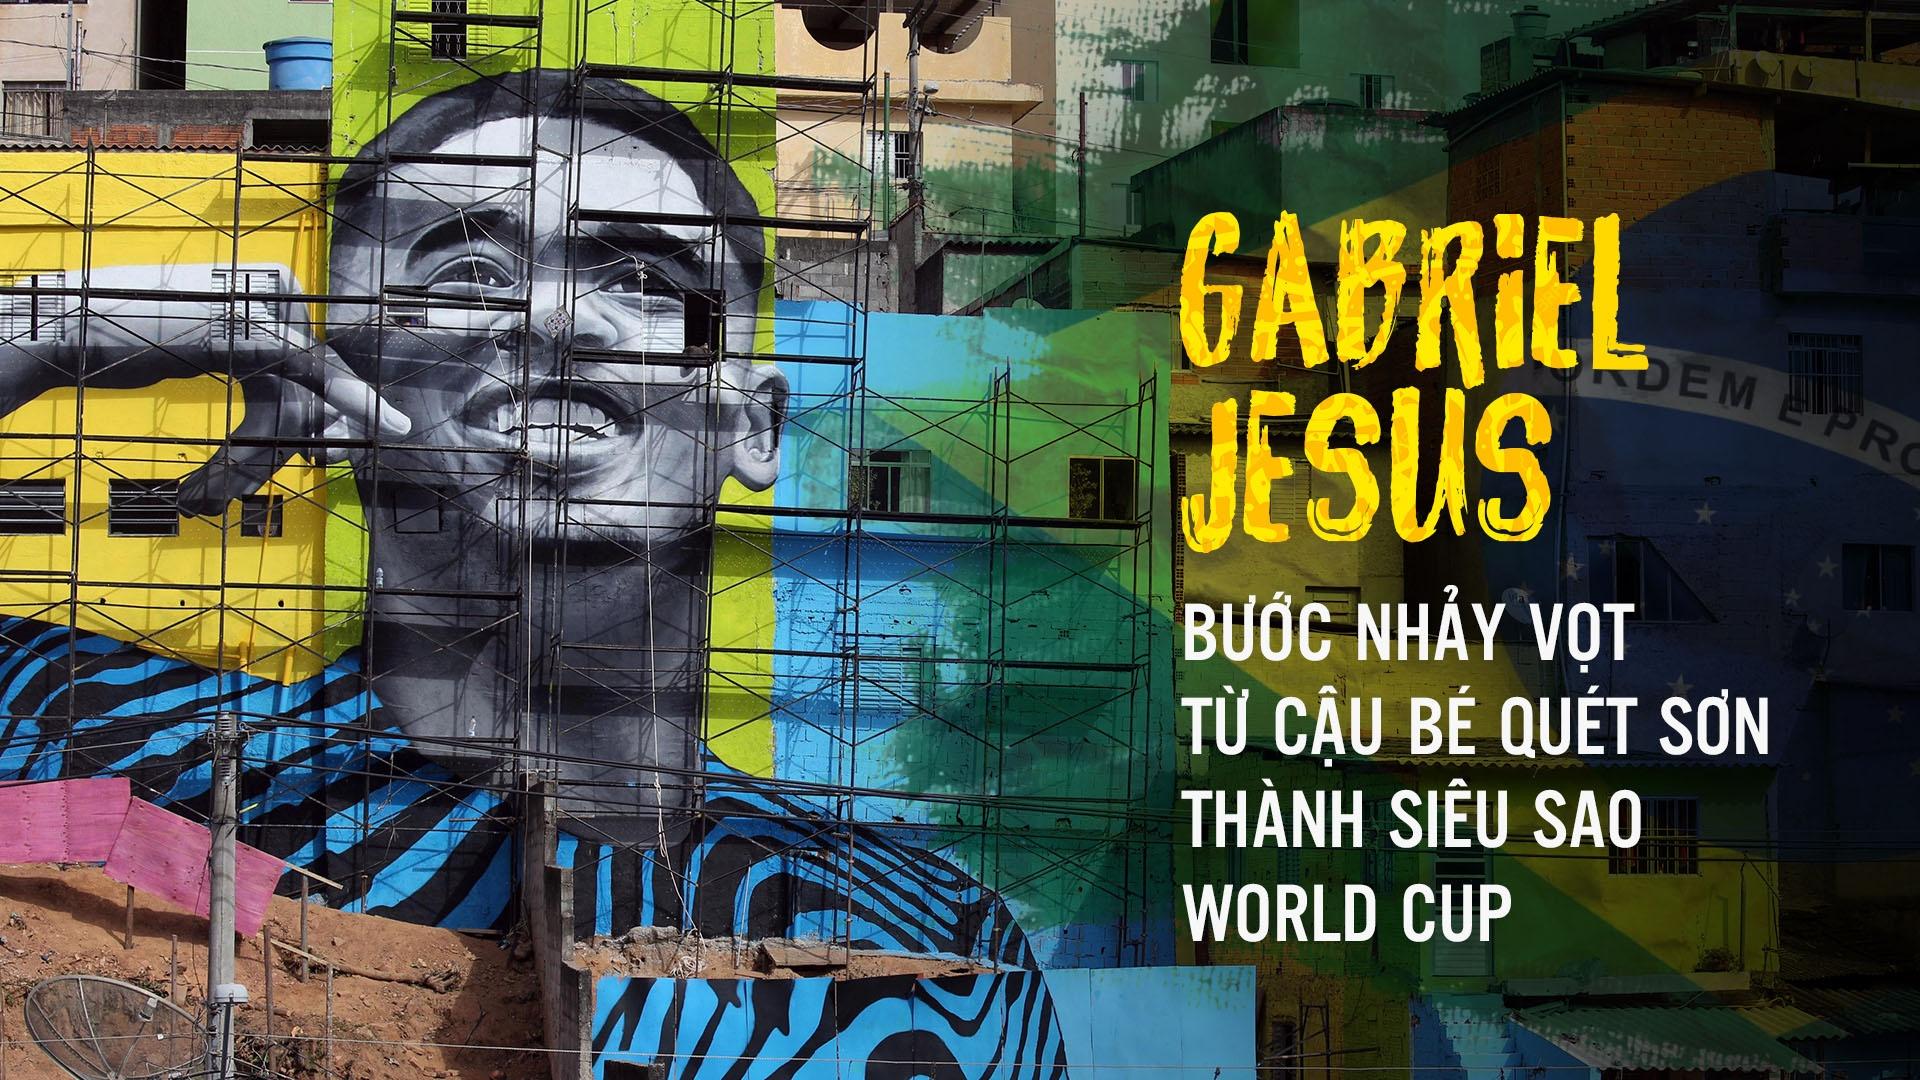 Gabriel Jesus - buoc nhay vot tu cau be quet son thanh sao World Cup hinh anh 2